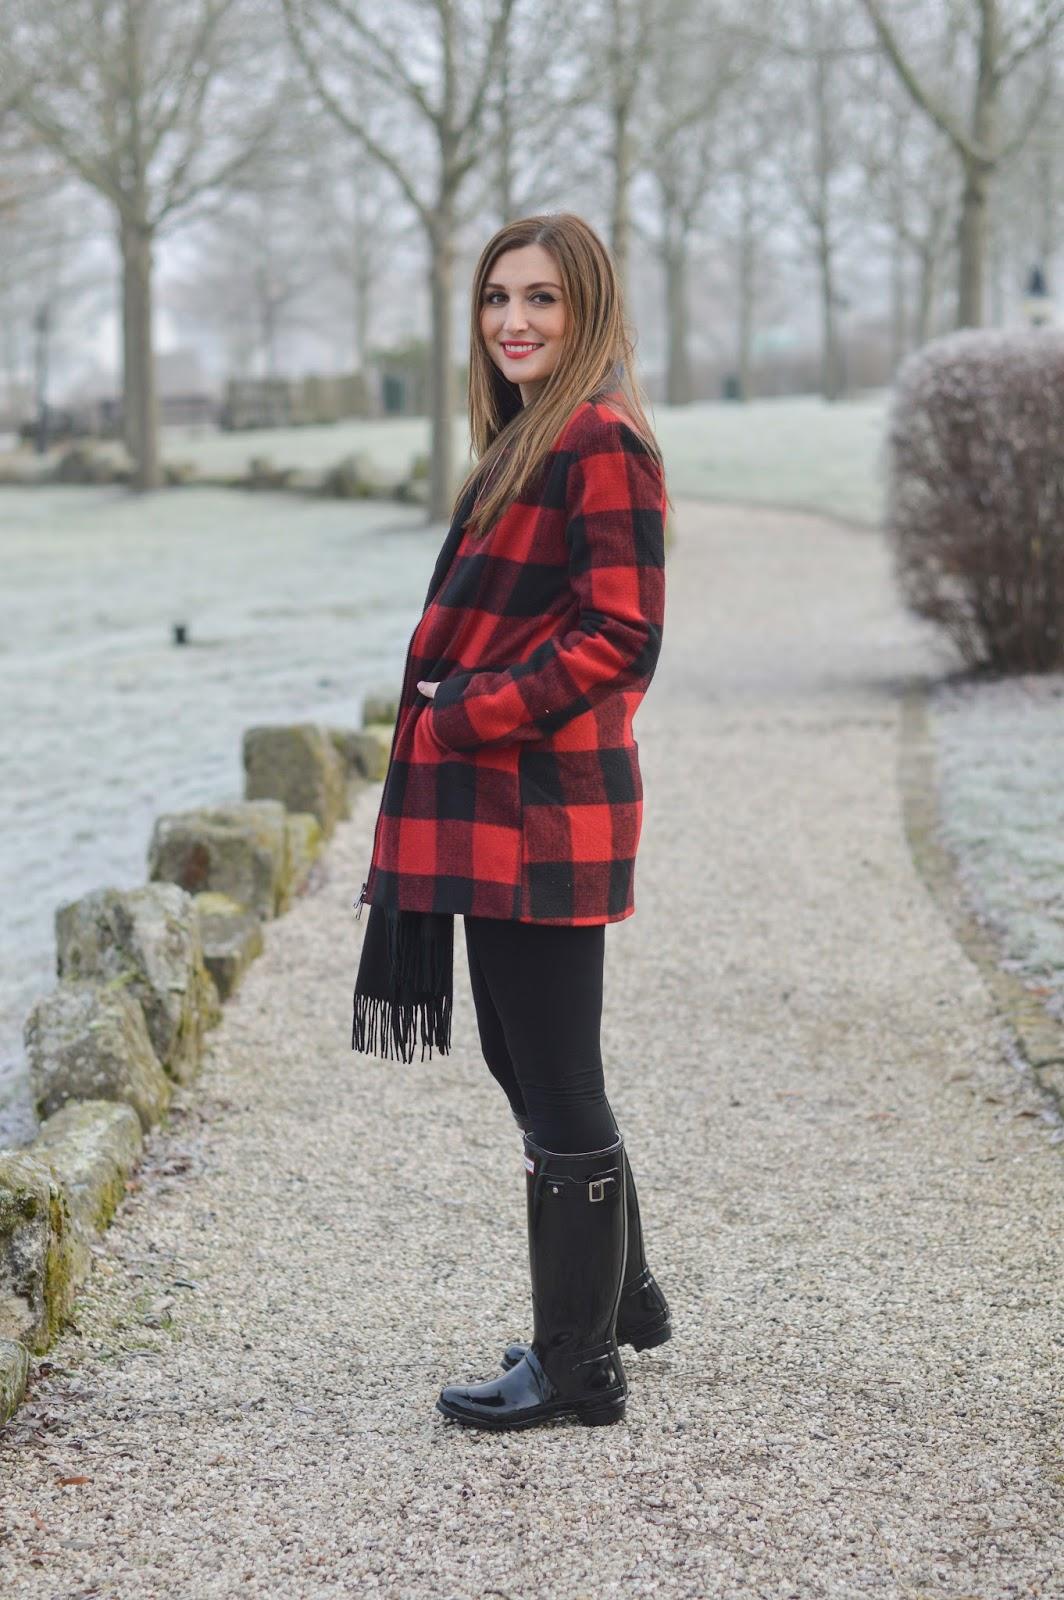 Karo in Rot-Schwarz - Schwarze Hunter boots - schwarze hunter gummiestiefel - frankfurt fashionblogger - fashionblogger aus frankfurt - deutsche modeblogger - fashionblogger aus deutschland - fashionblogge rmit hunter stiefeln